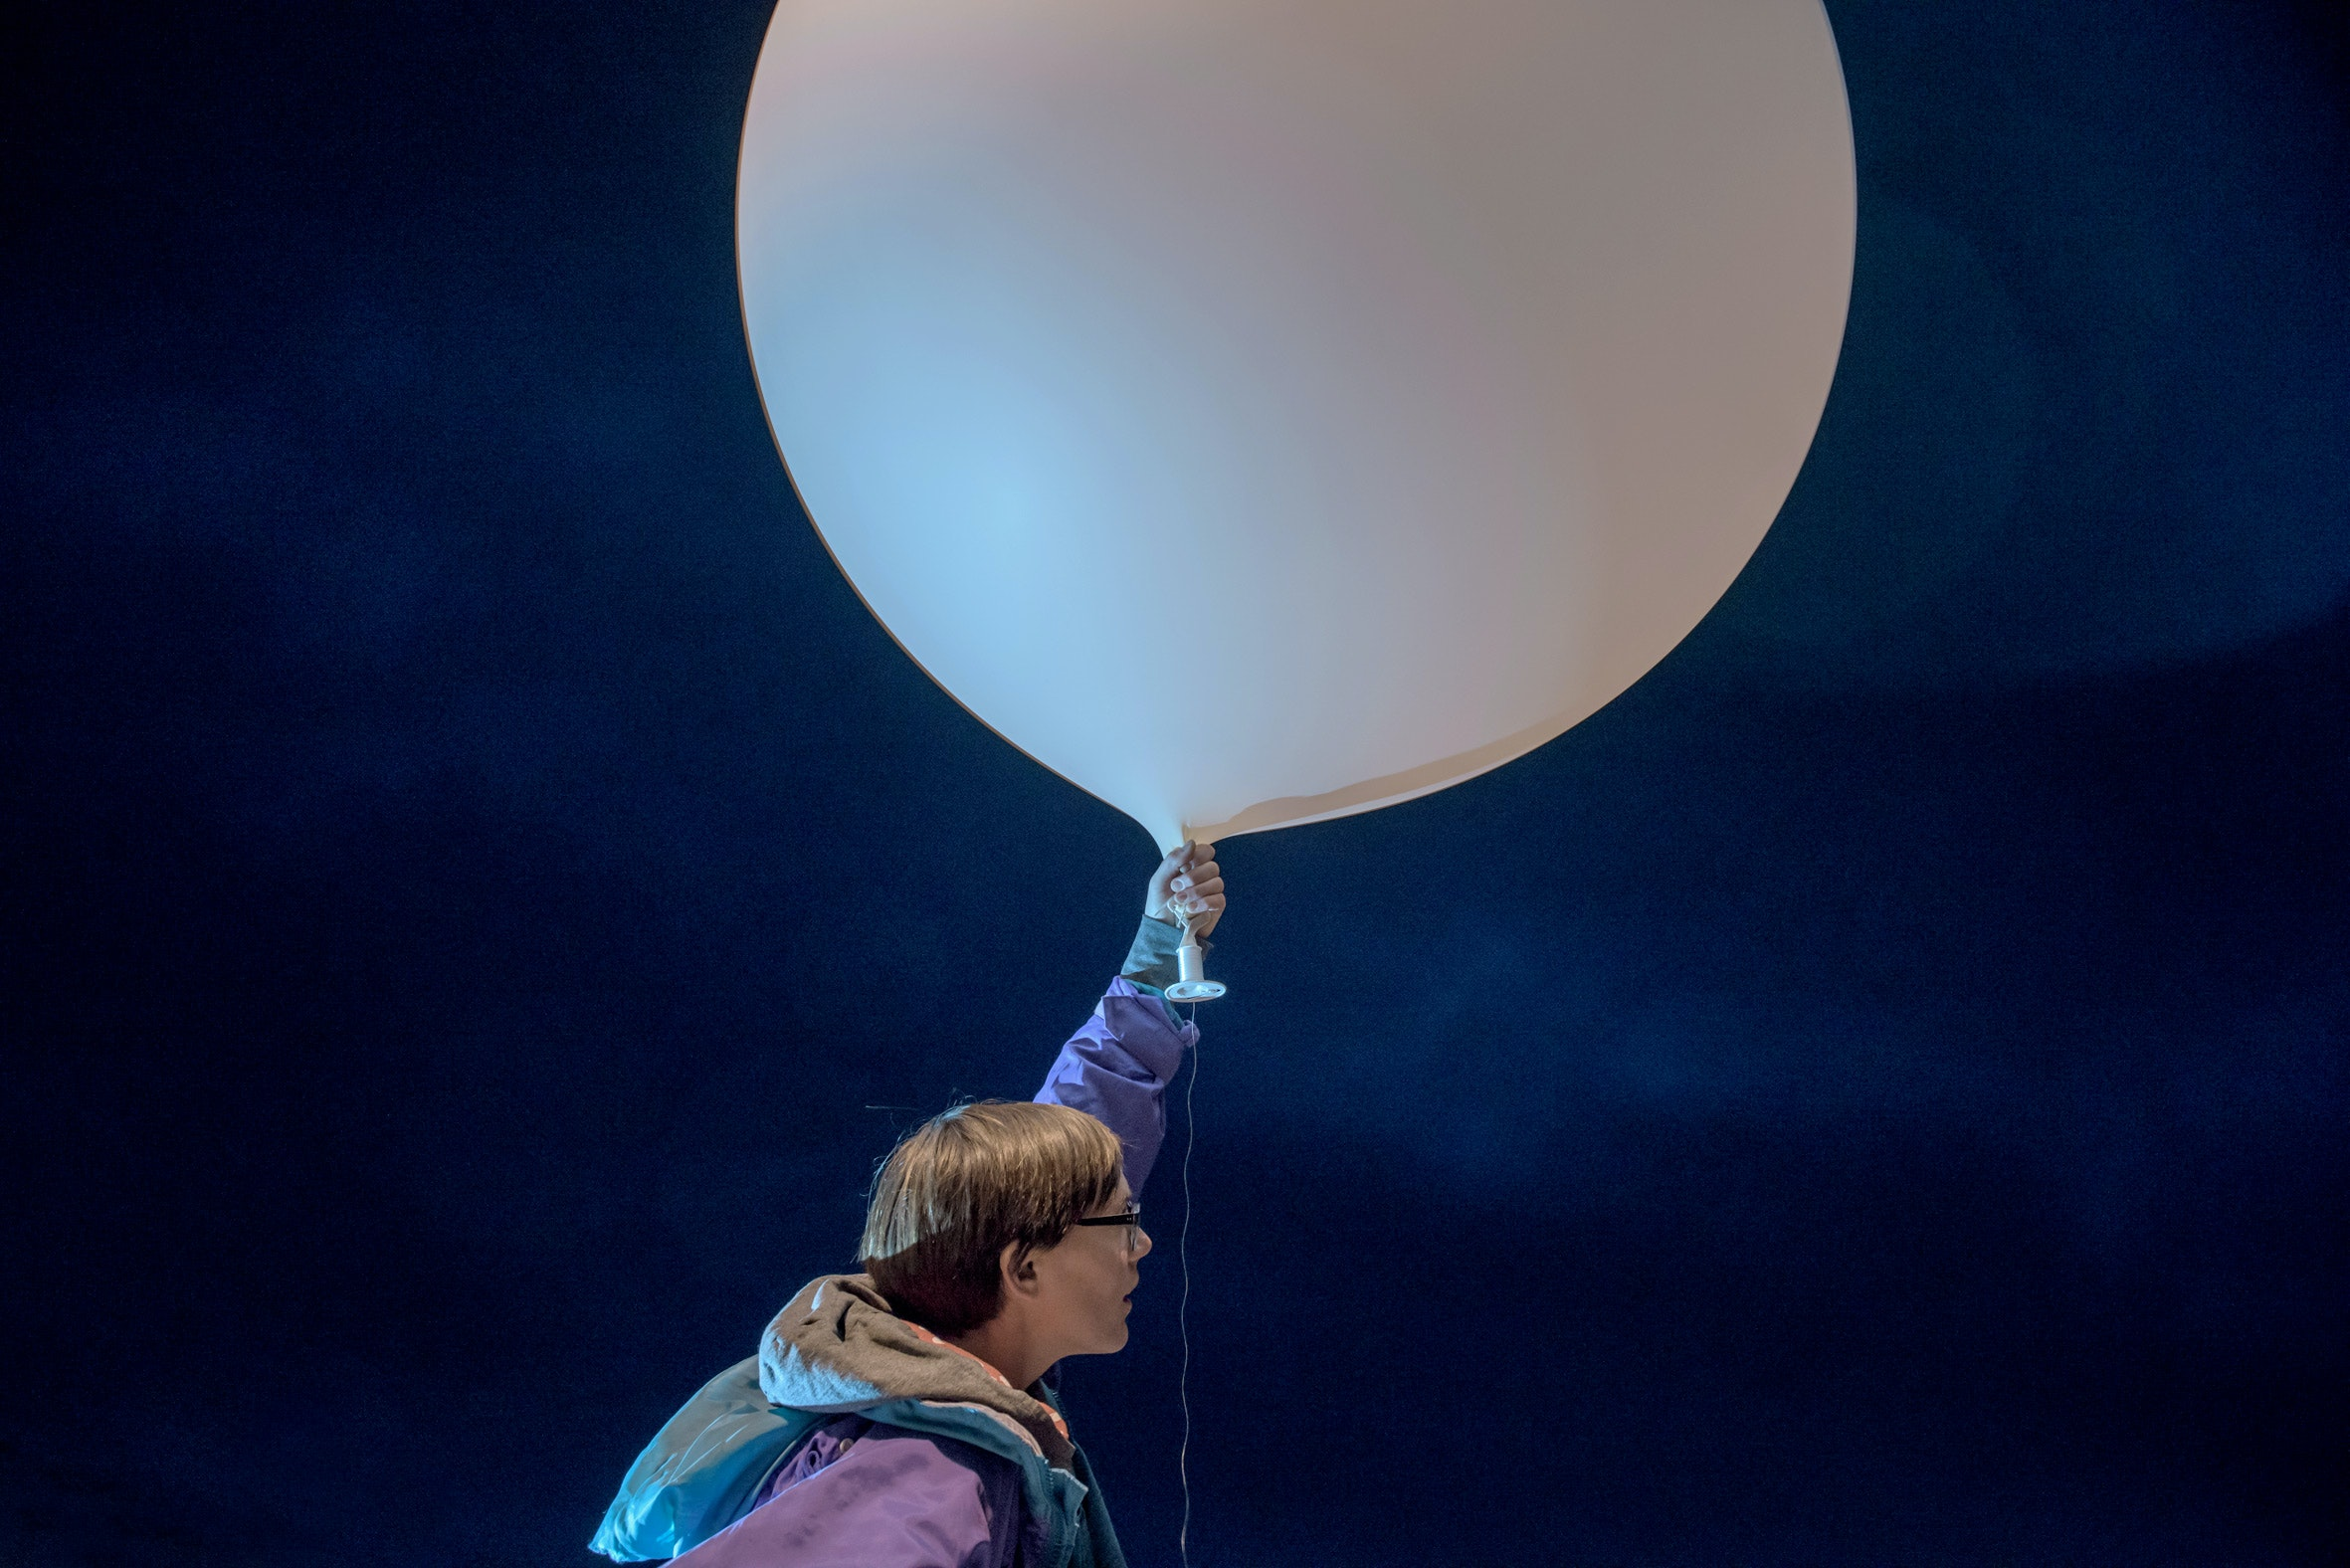 Michael Loos - balloon-0927